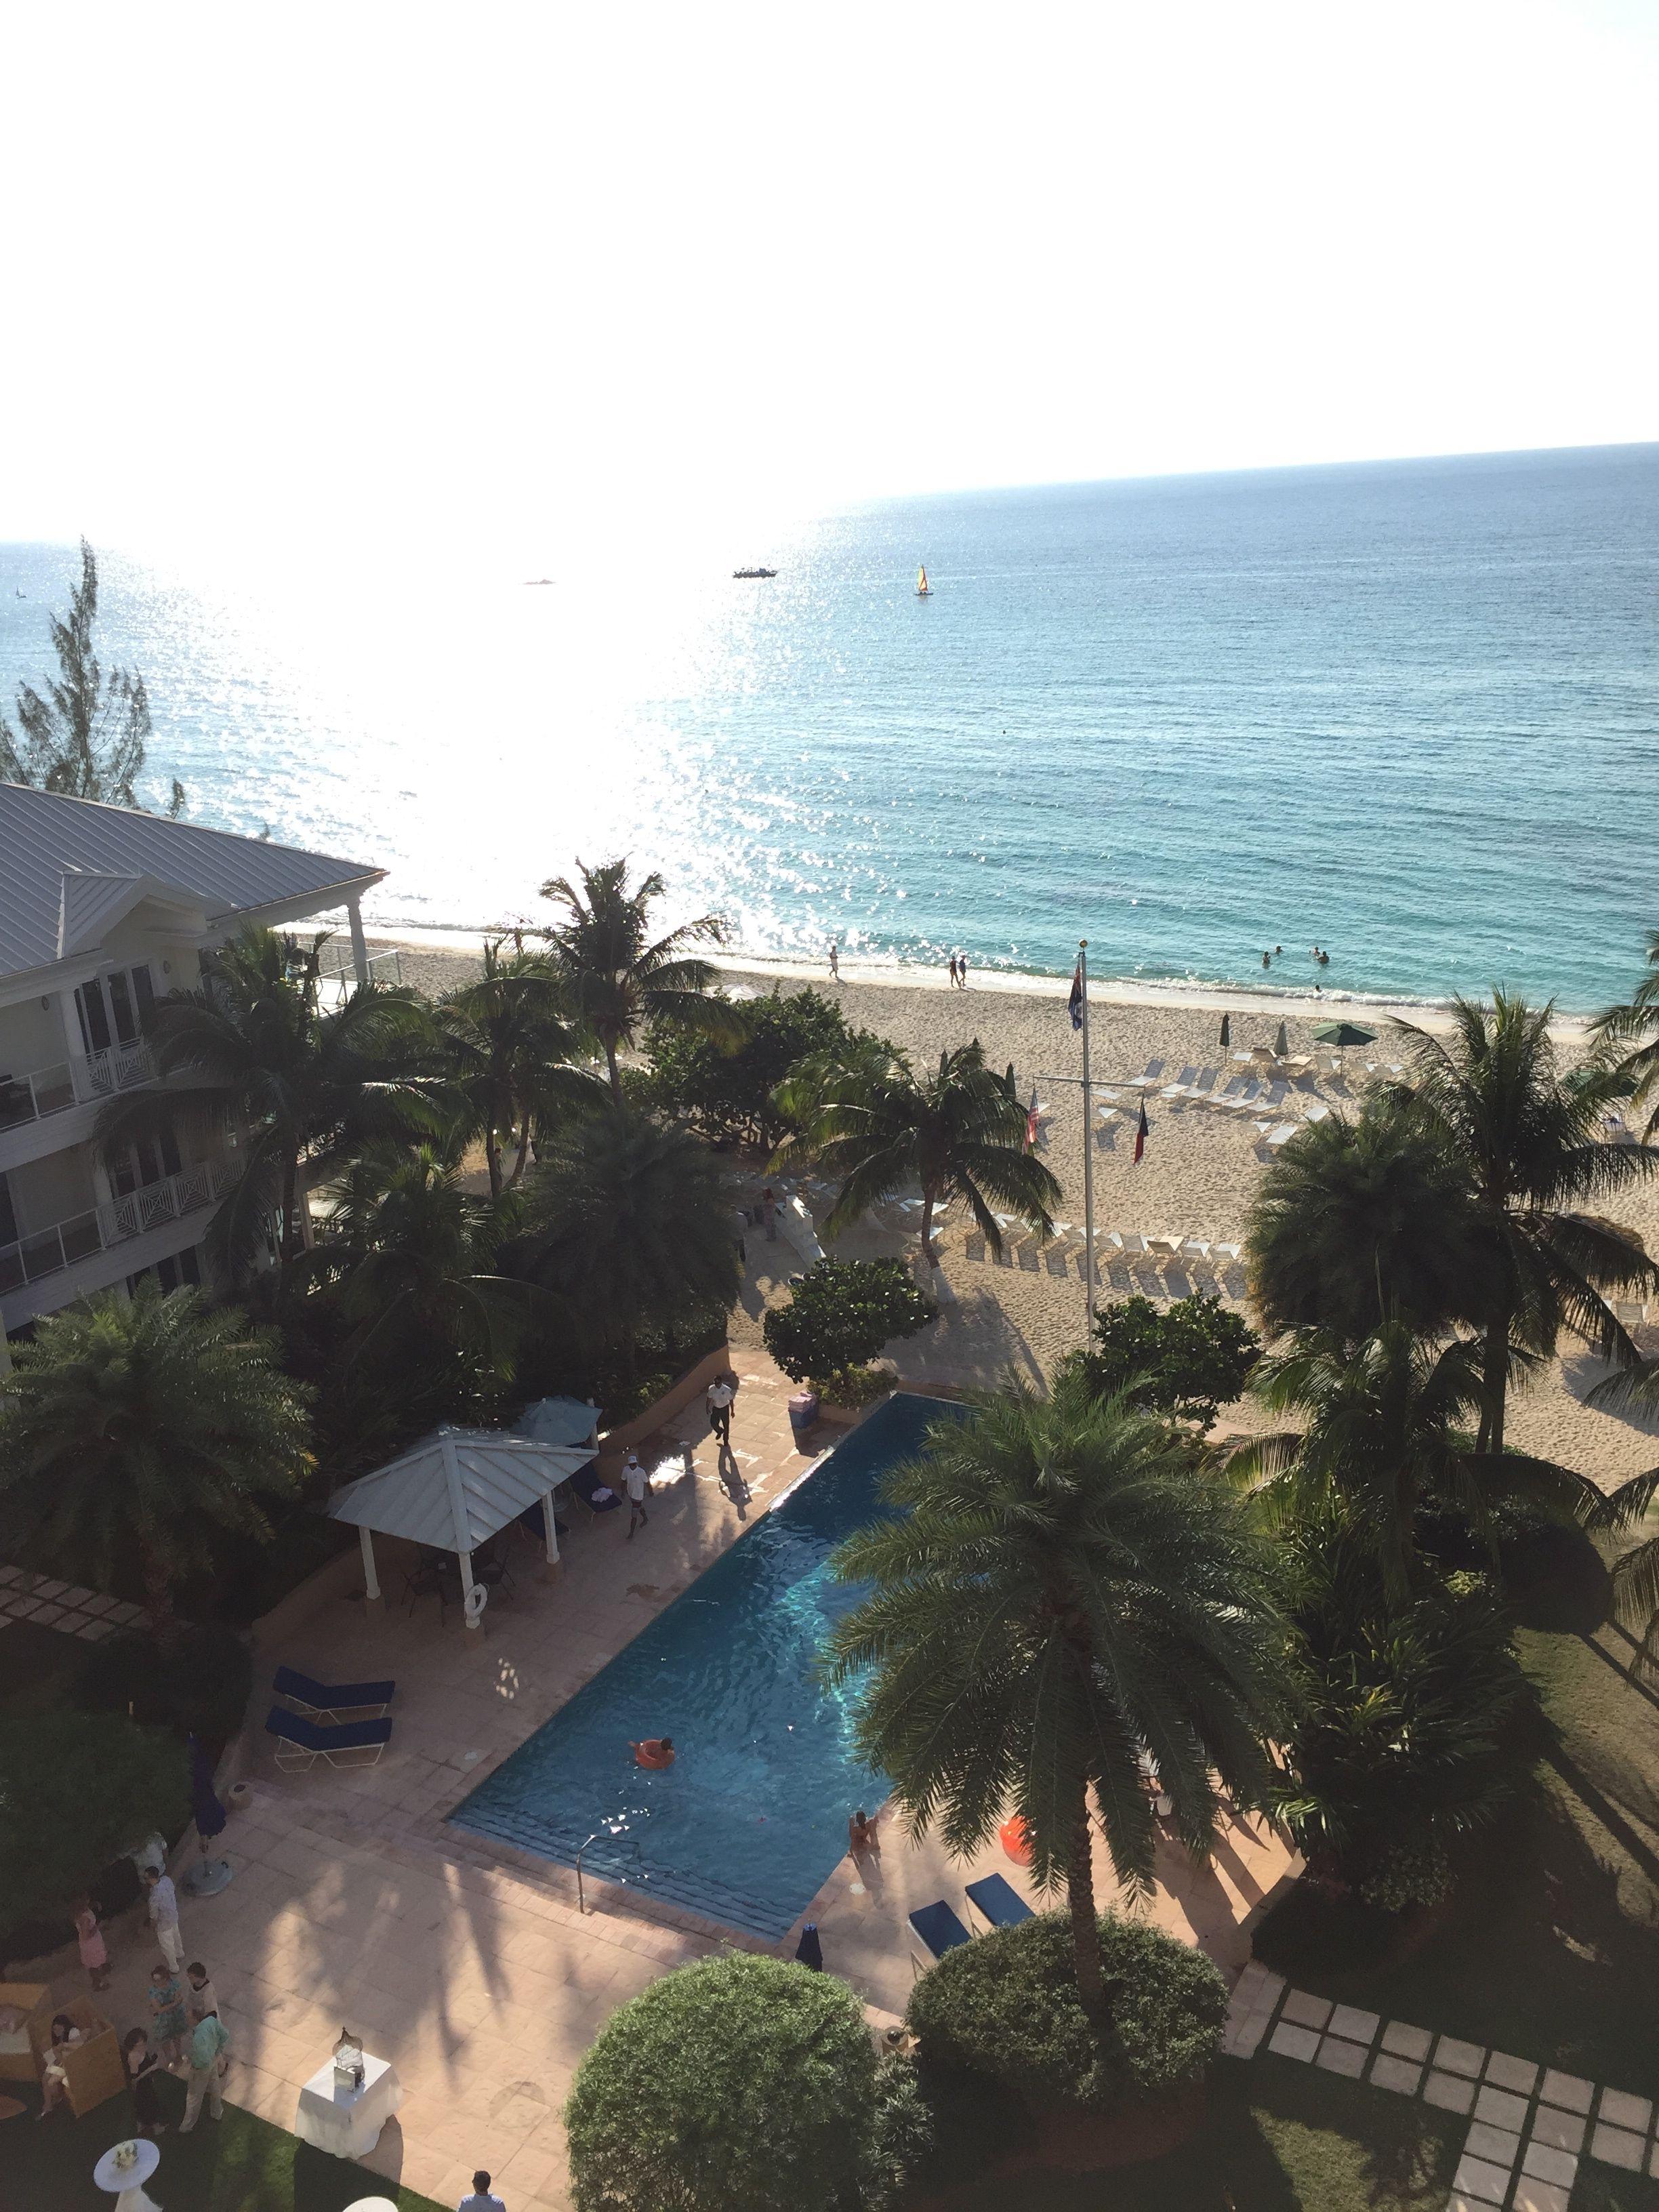 Best view @caribbeanclub @celebrationsltd best wedding location!